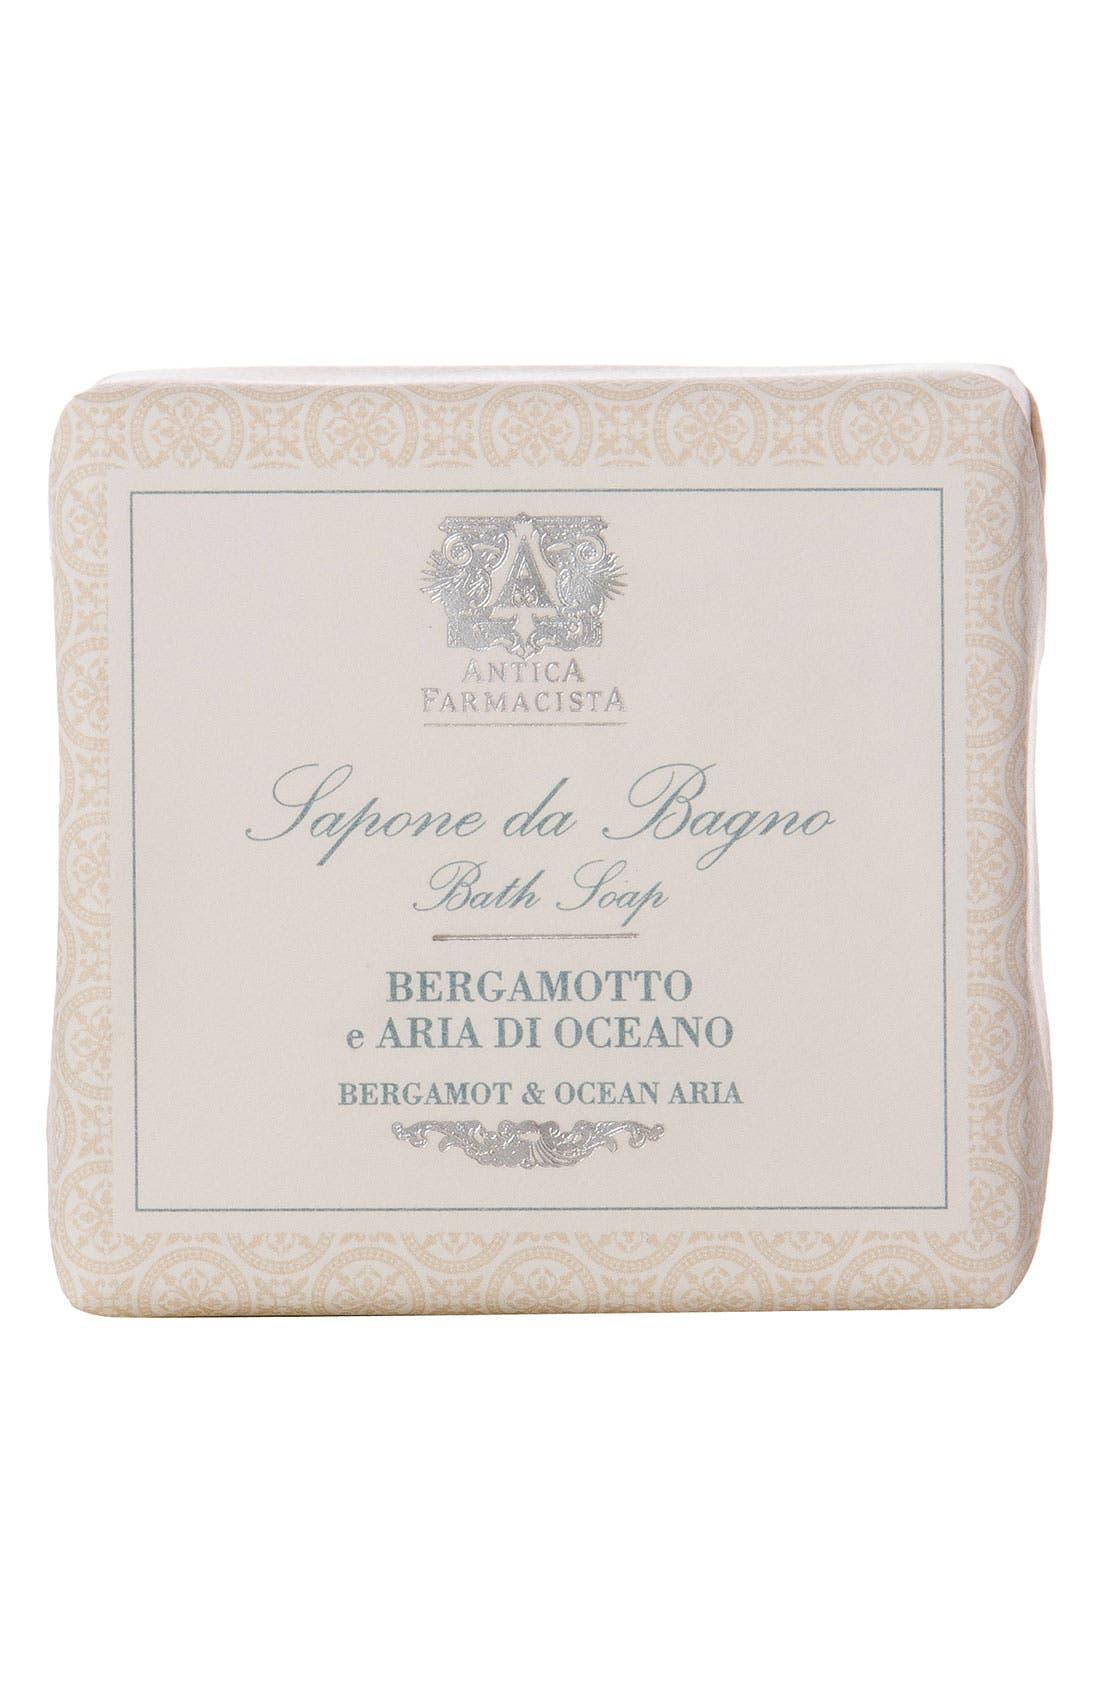 'Bergamot & Ocean Aria' Bar Soap,                             Main thumbnail 1, color,                             000